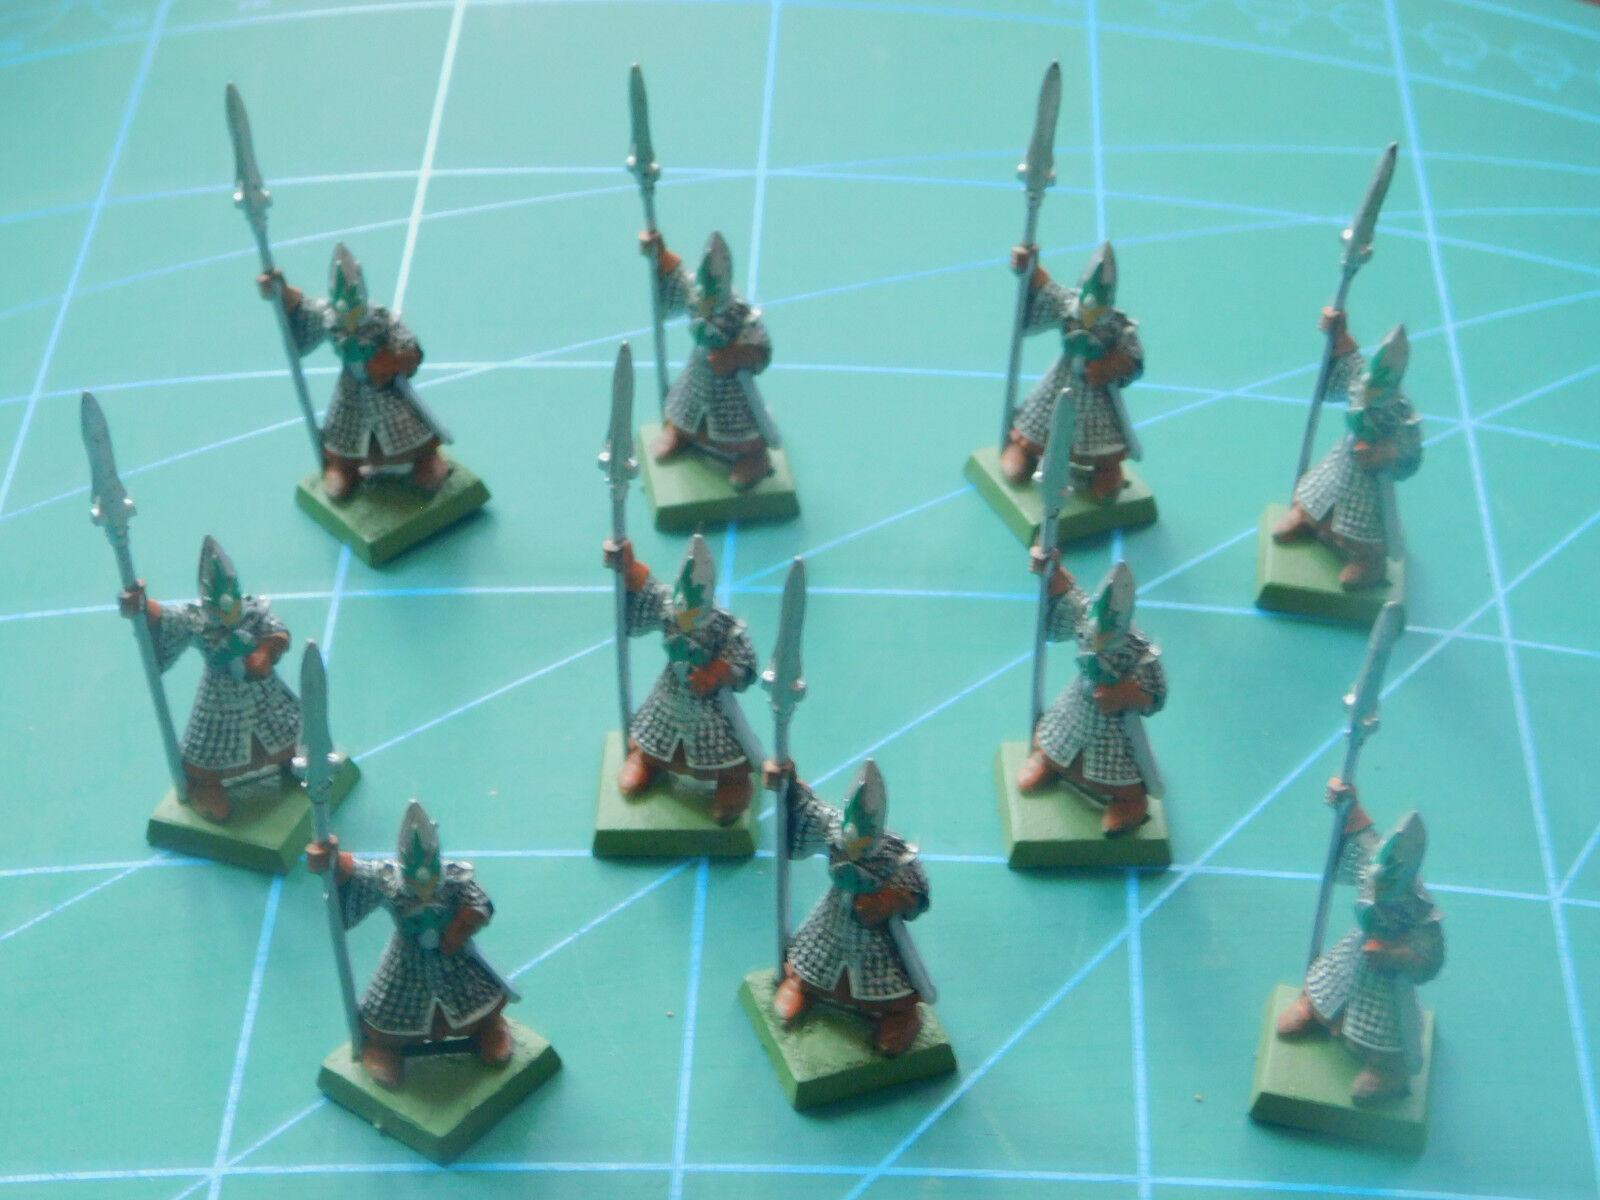 10 WARHAMMER 40k Dungeon Dragons Soldato Guerriero  Dipinto cifra in plastica  vendita di offerte